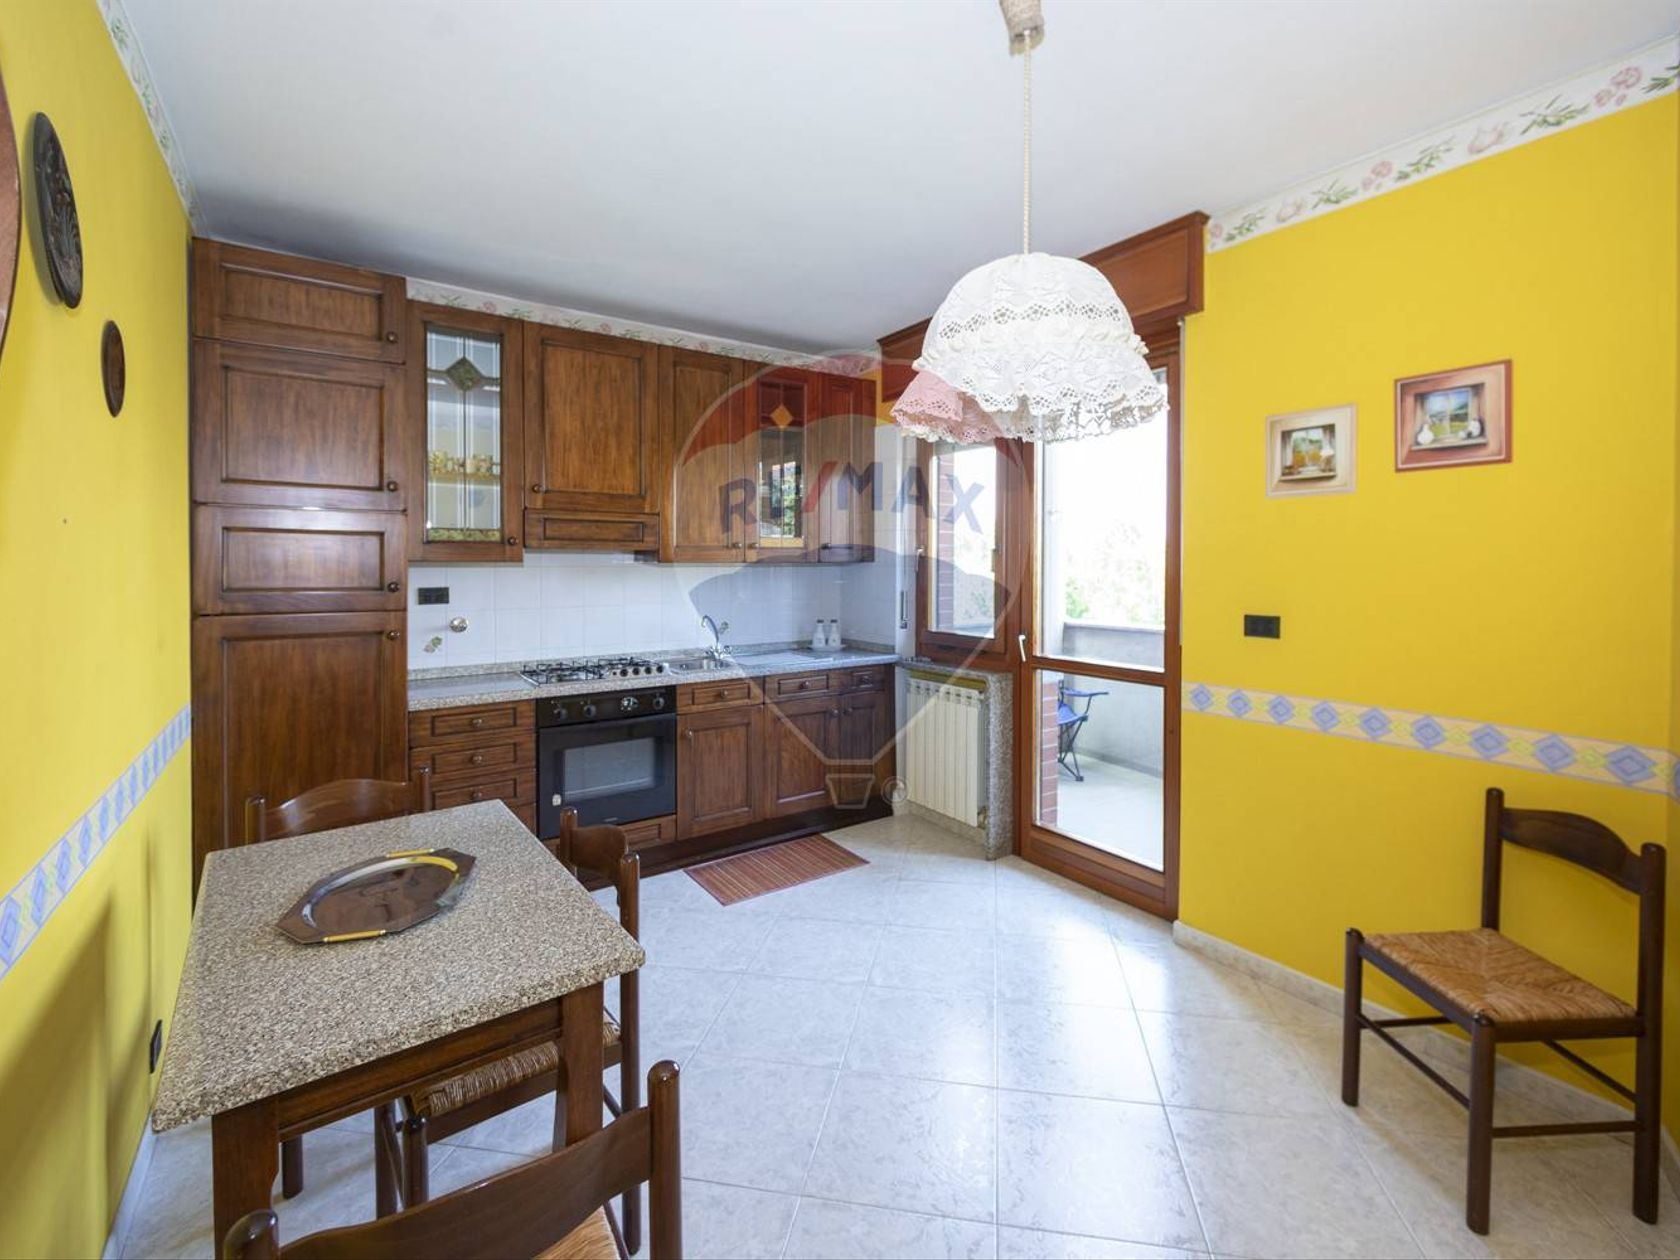 Appartamento Lucento, Torino, TO Vendita - Foto 10